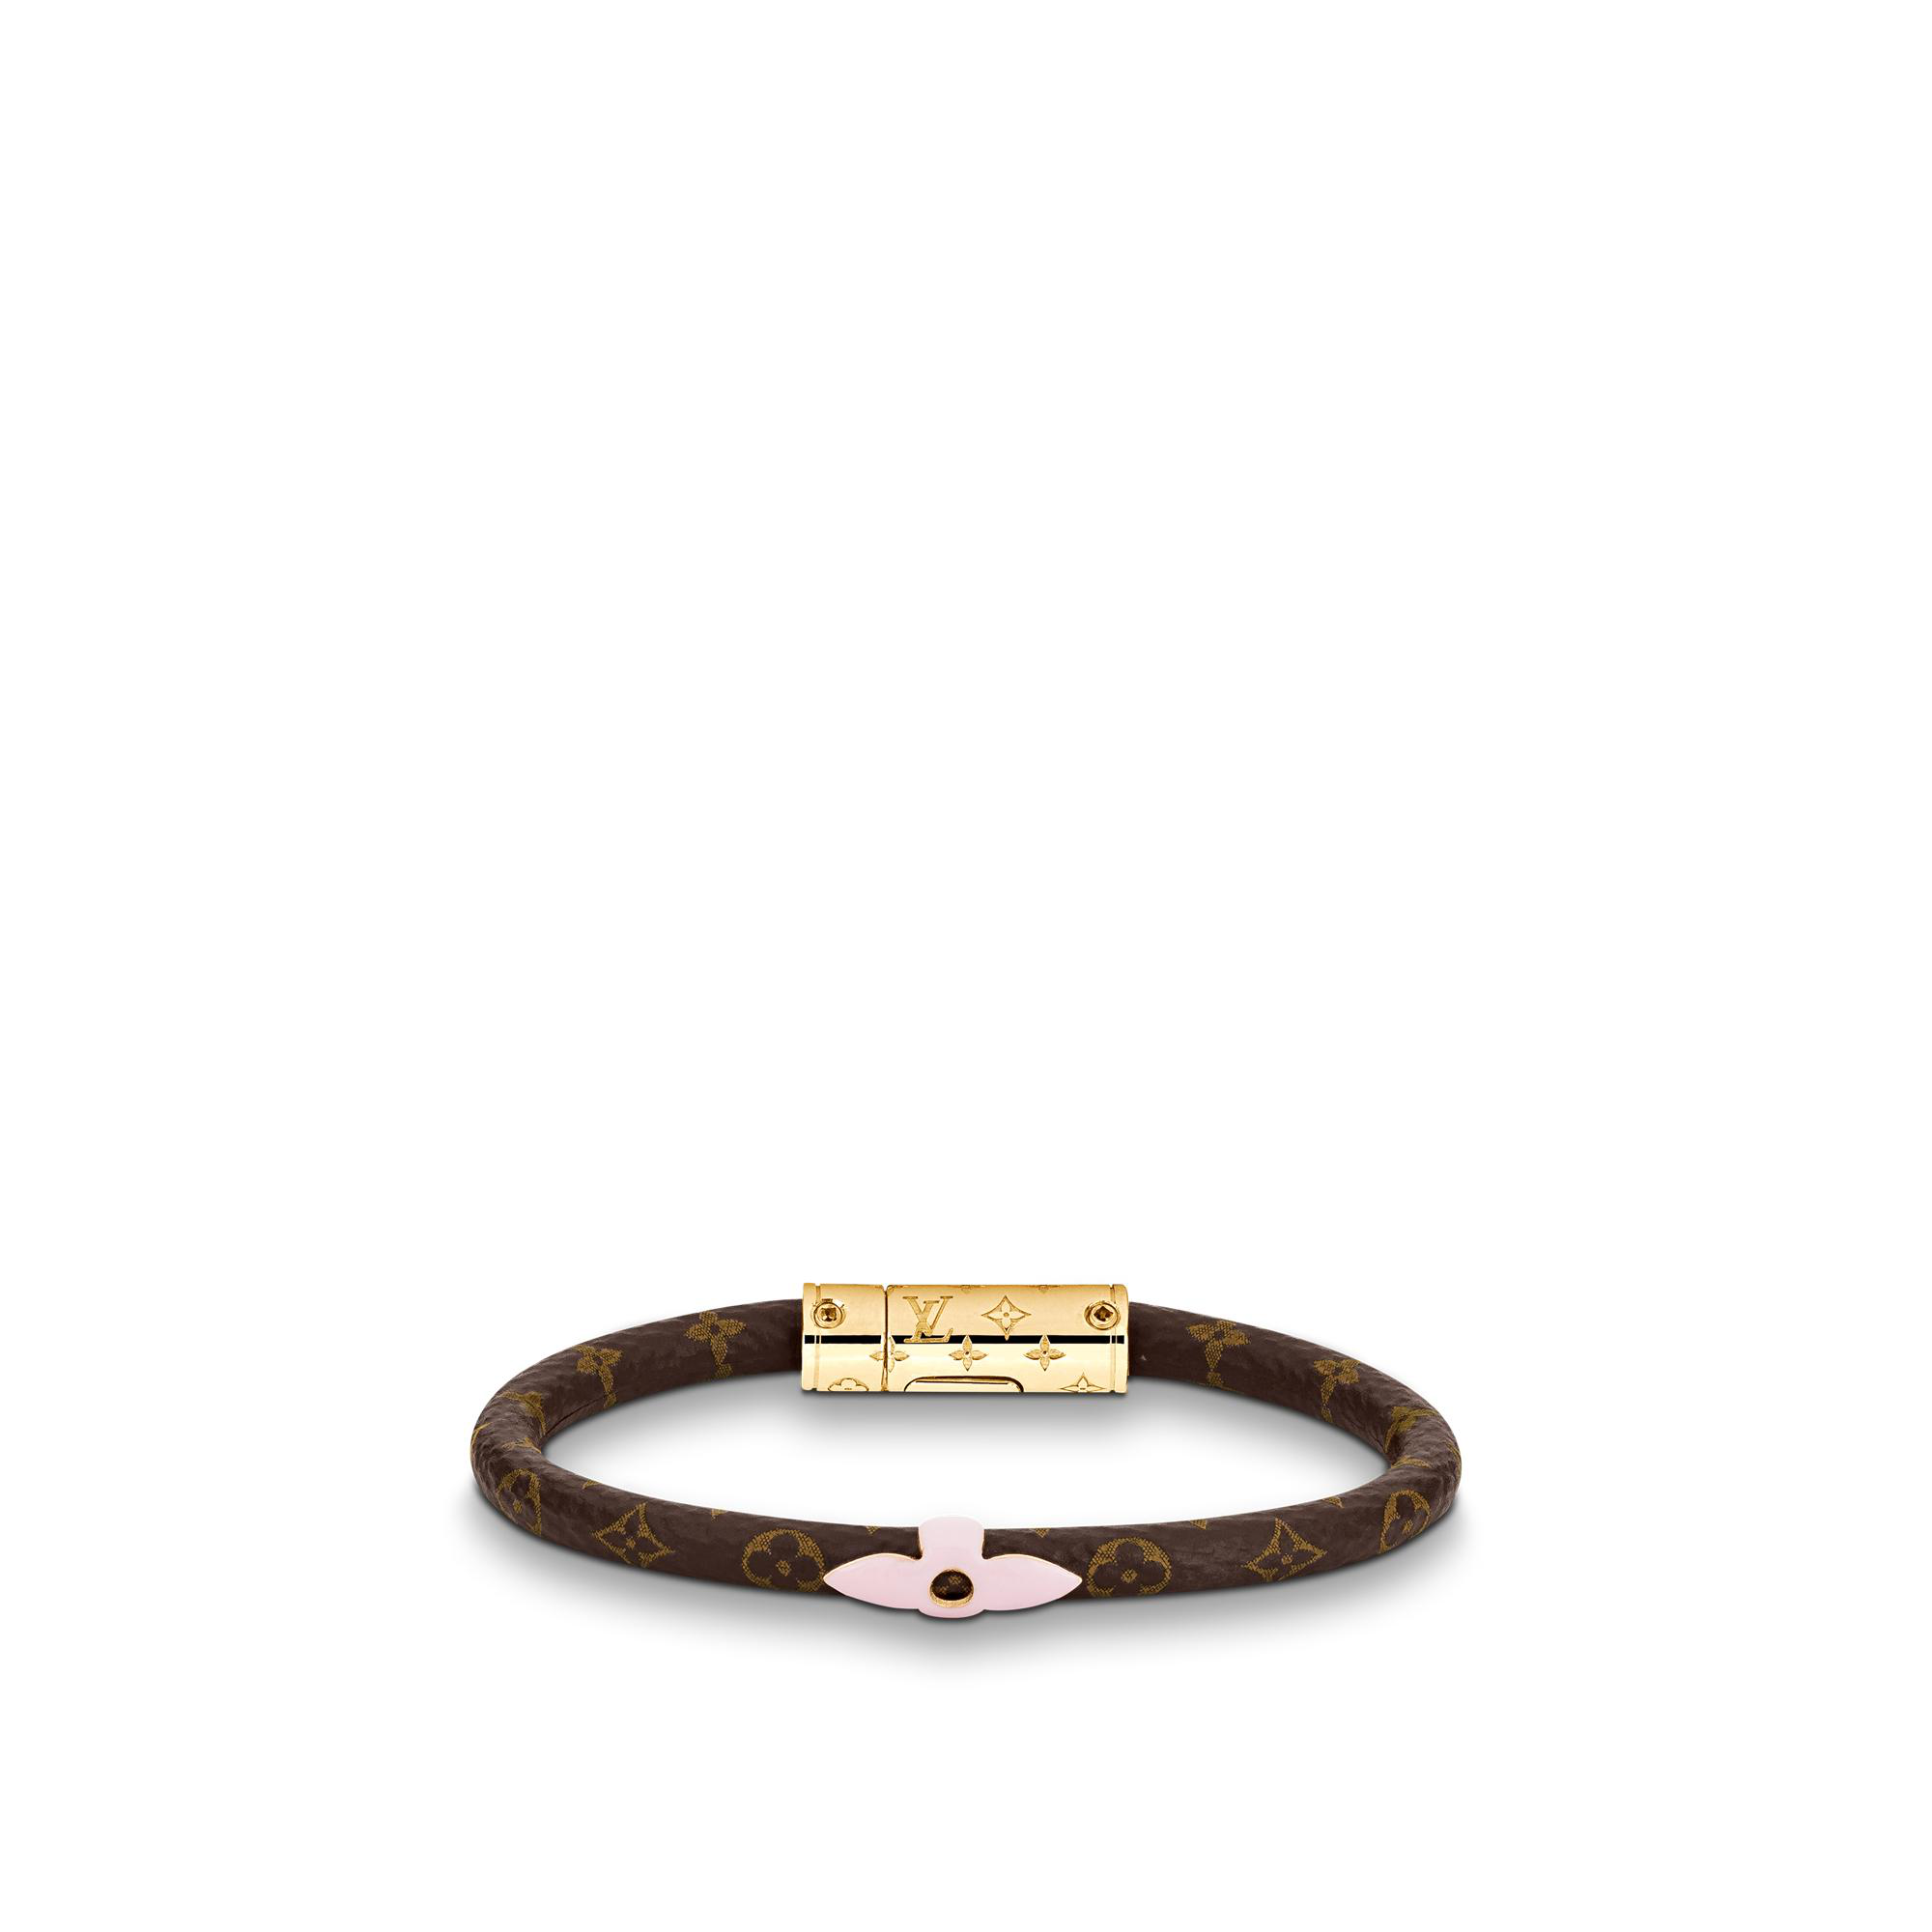 Louis Vuitton Daily Confidential Bracelet In Rose Poudre